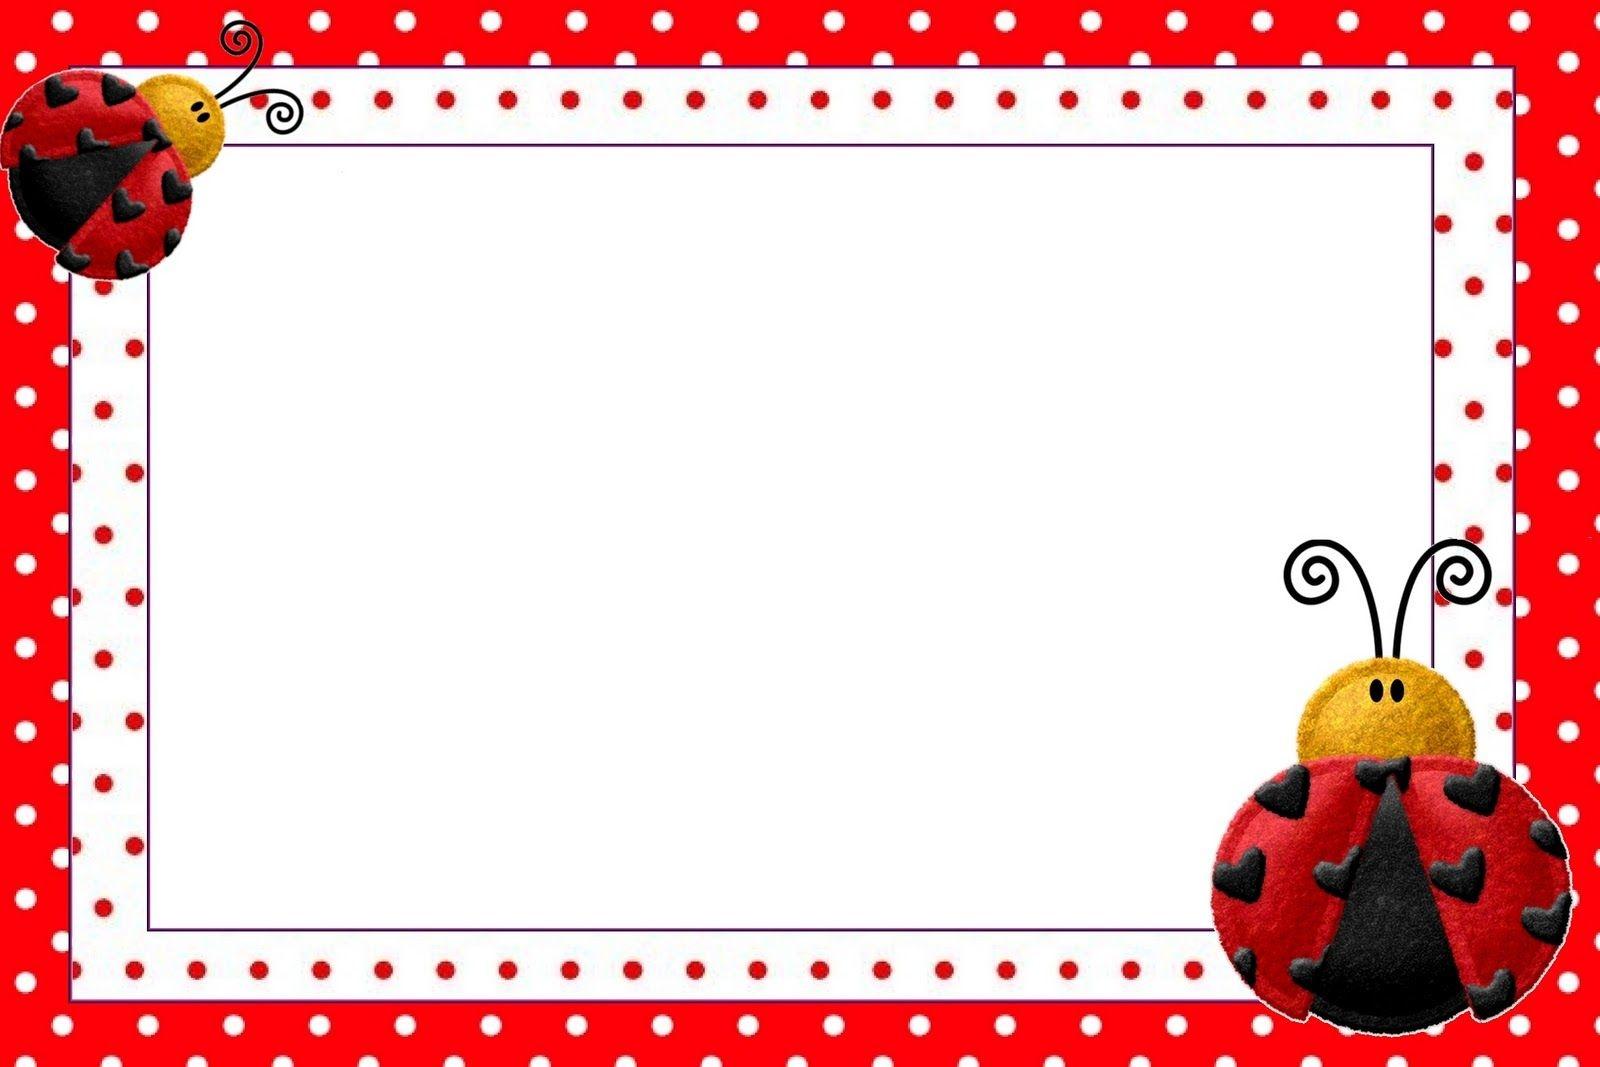 Lovely Ladybugs Free Printable Invitations.   Ladybugs   Ladybug - Free Printable Ladybug Stationery